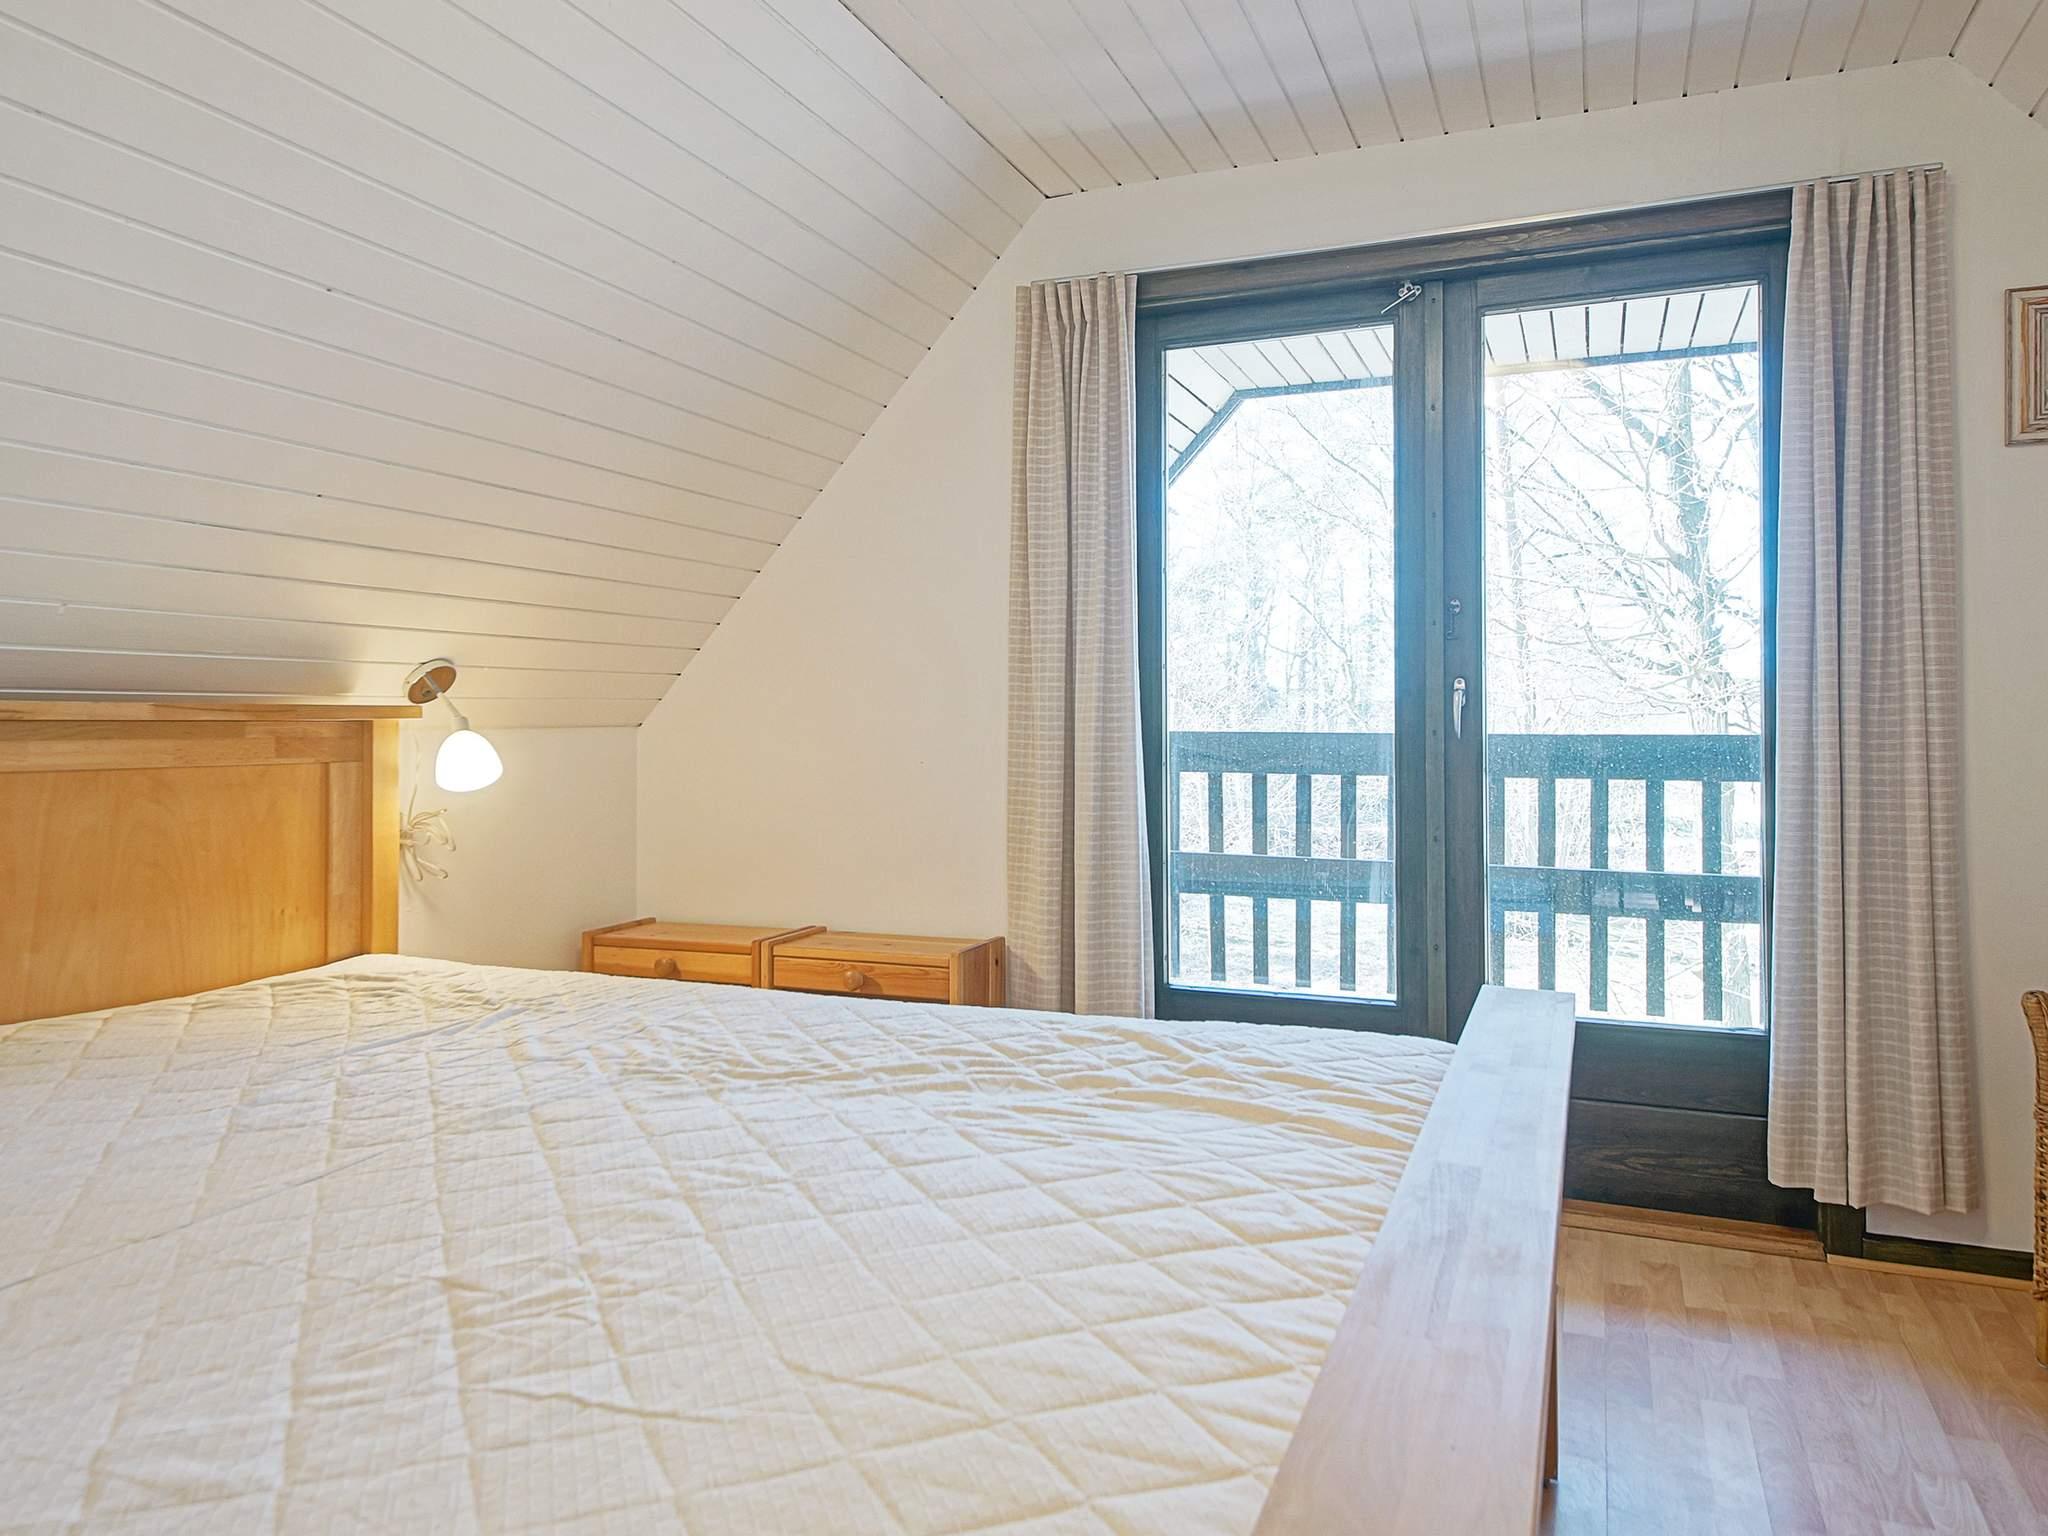 Ferienhaus Balka Strand (81962), Balke, , Bornholm, Dänemark, Bild 13